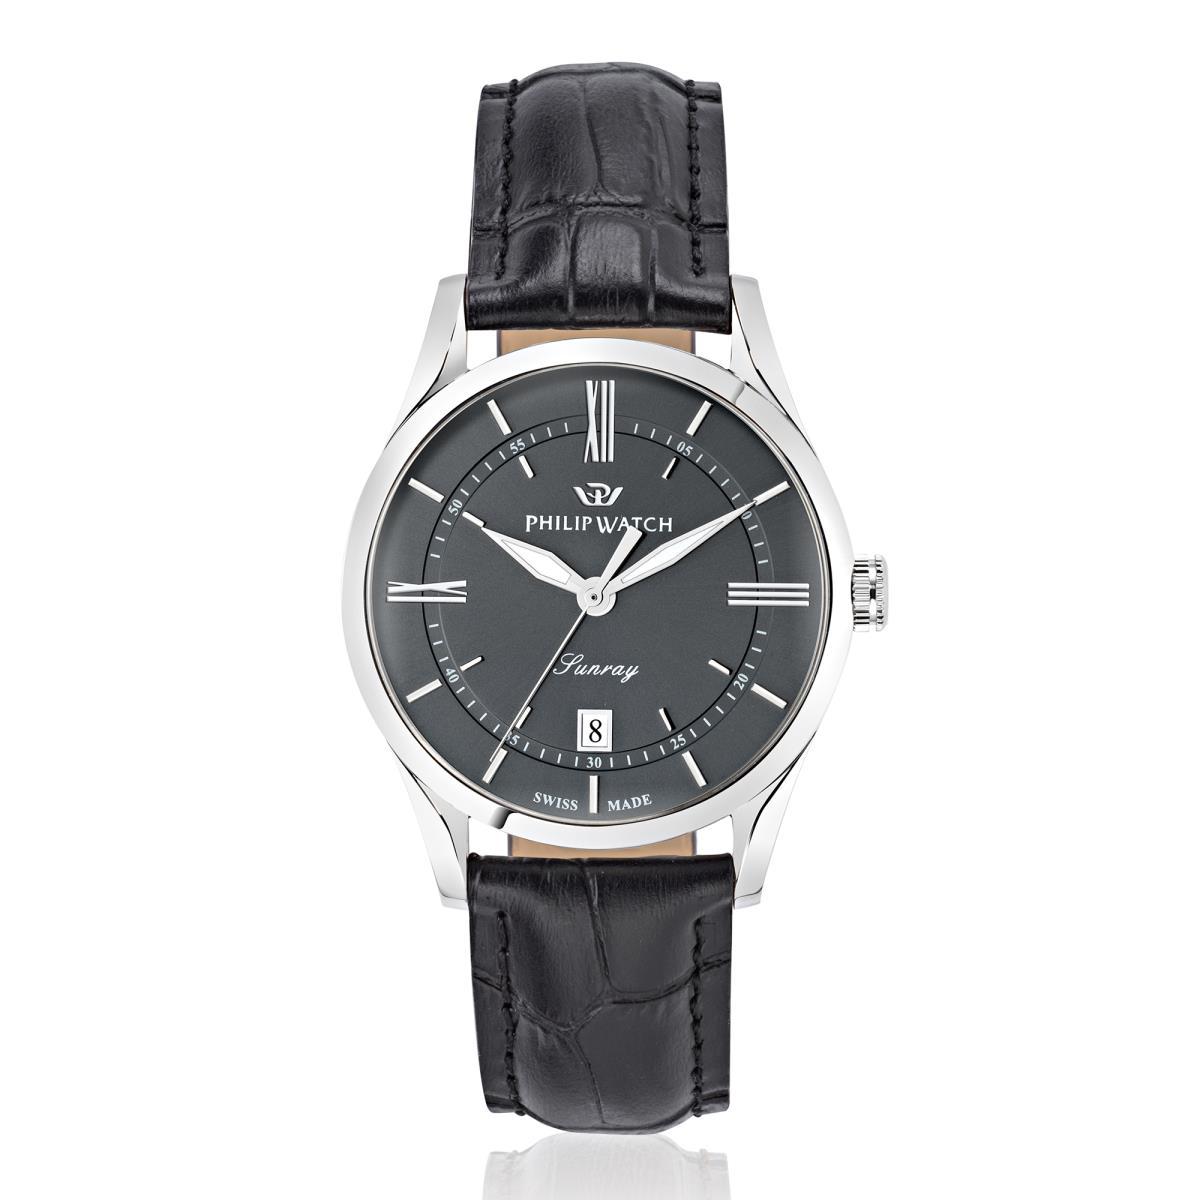 Orologio Philip Watch - Sunray Ref. R8251180007 - PHILIP WATCH